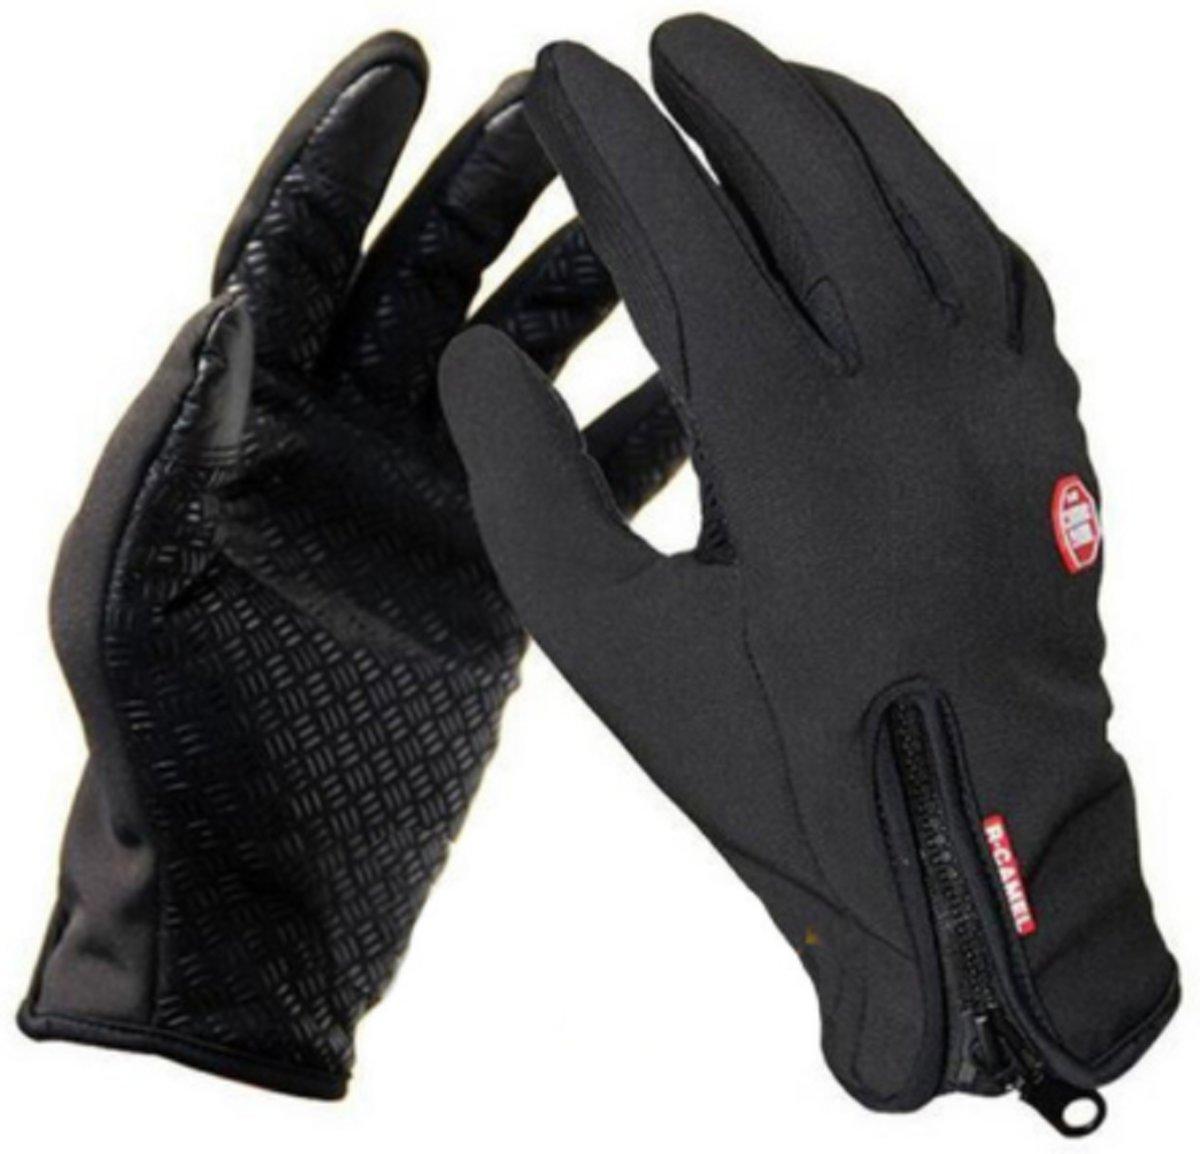 Handschoenen L - Wintersport - Schaatsen - Snowboarden - Skiën - Wielrennen - Uniseks - Zwart -Large